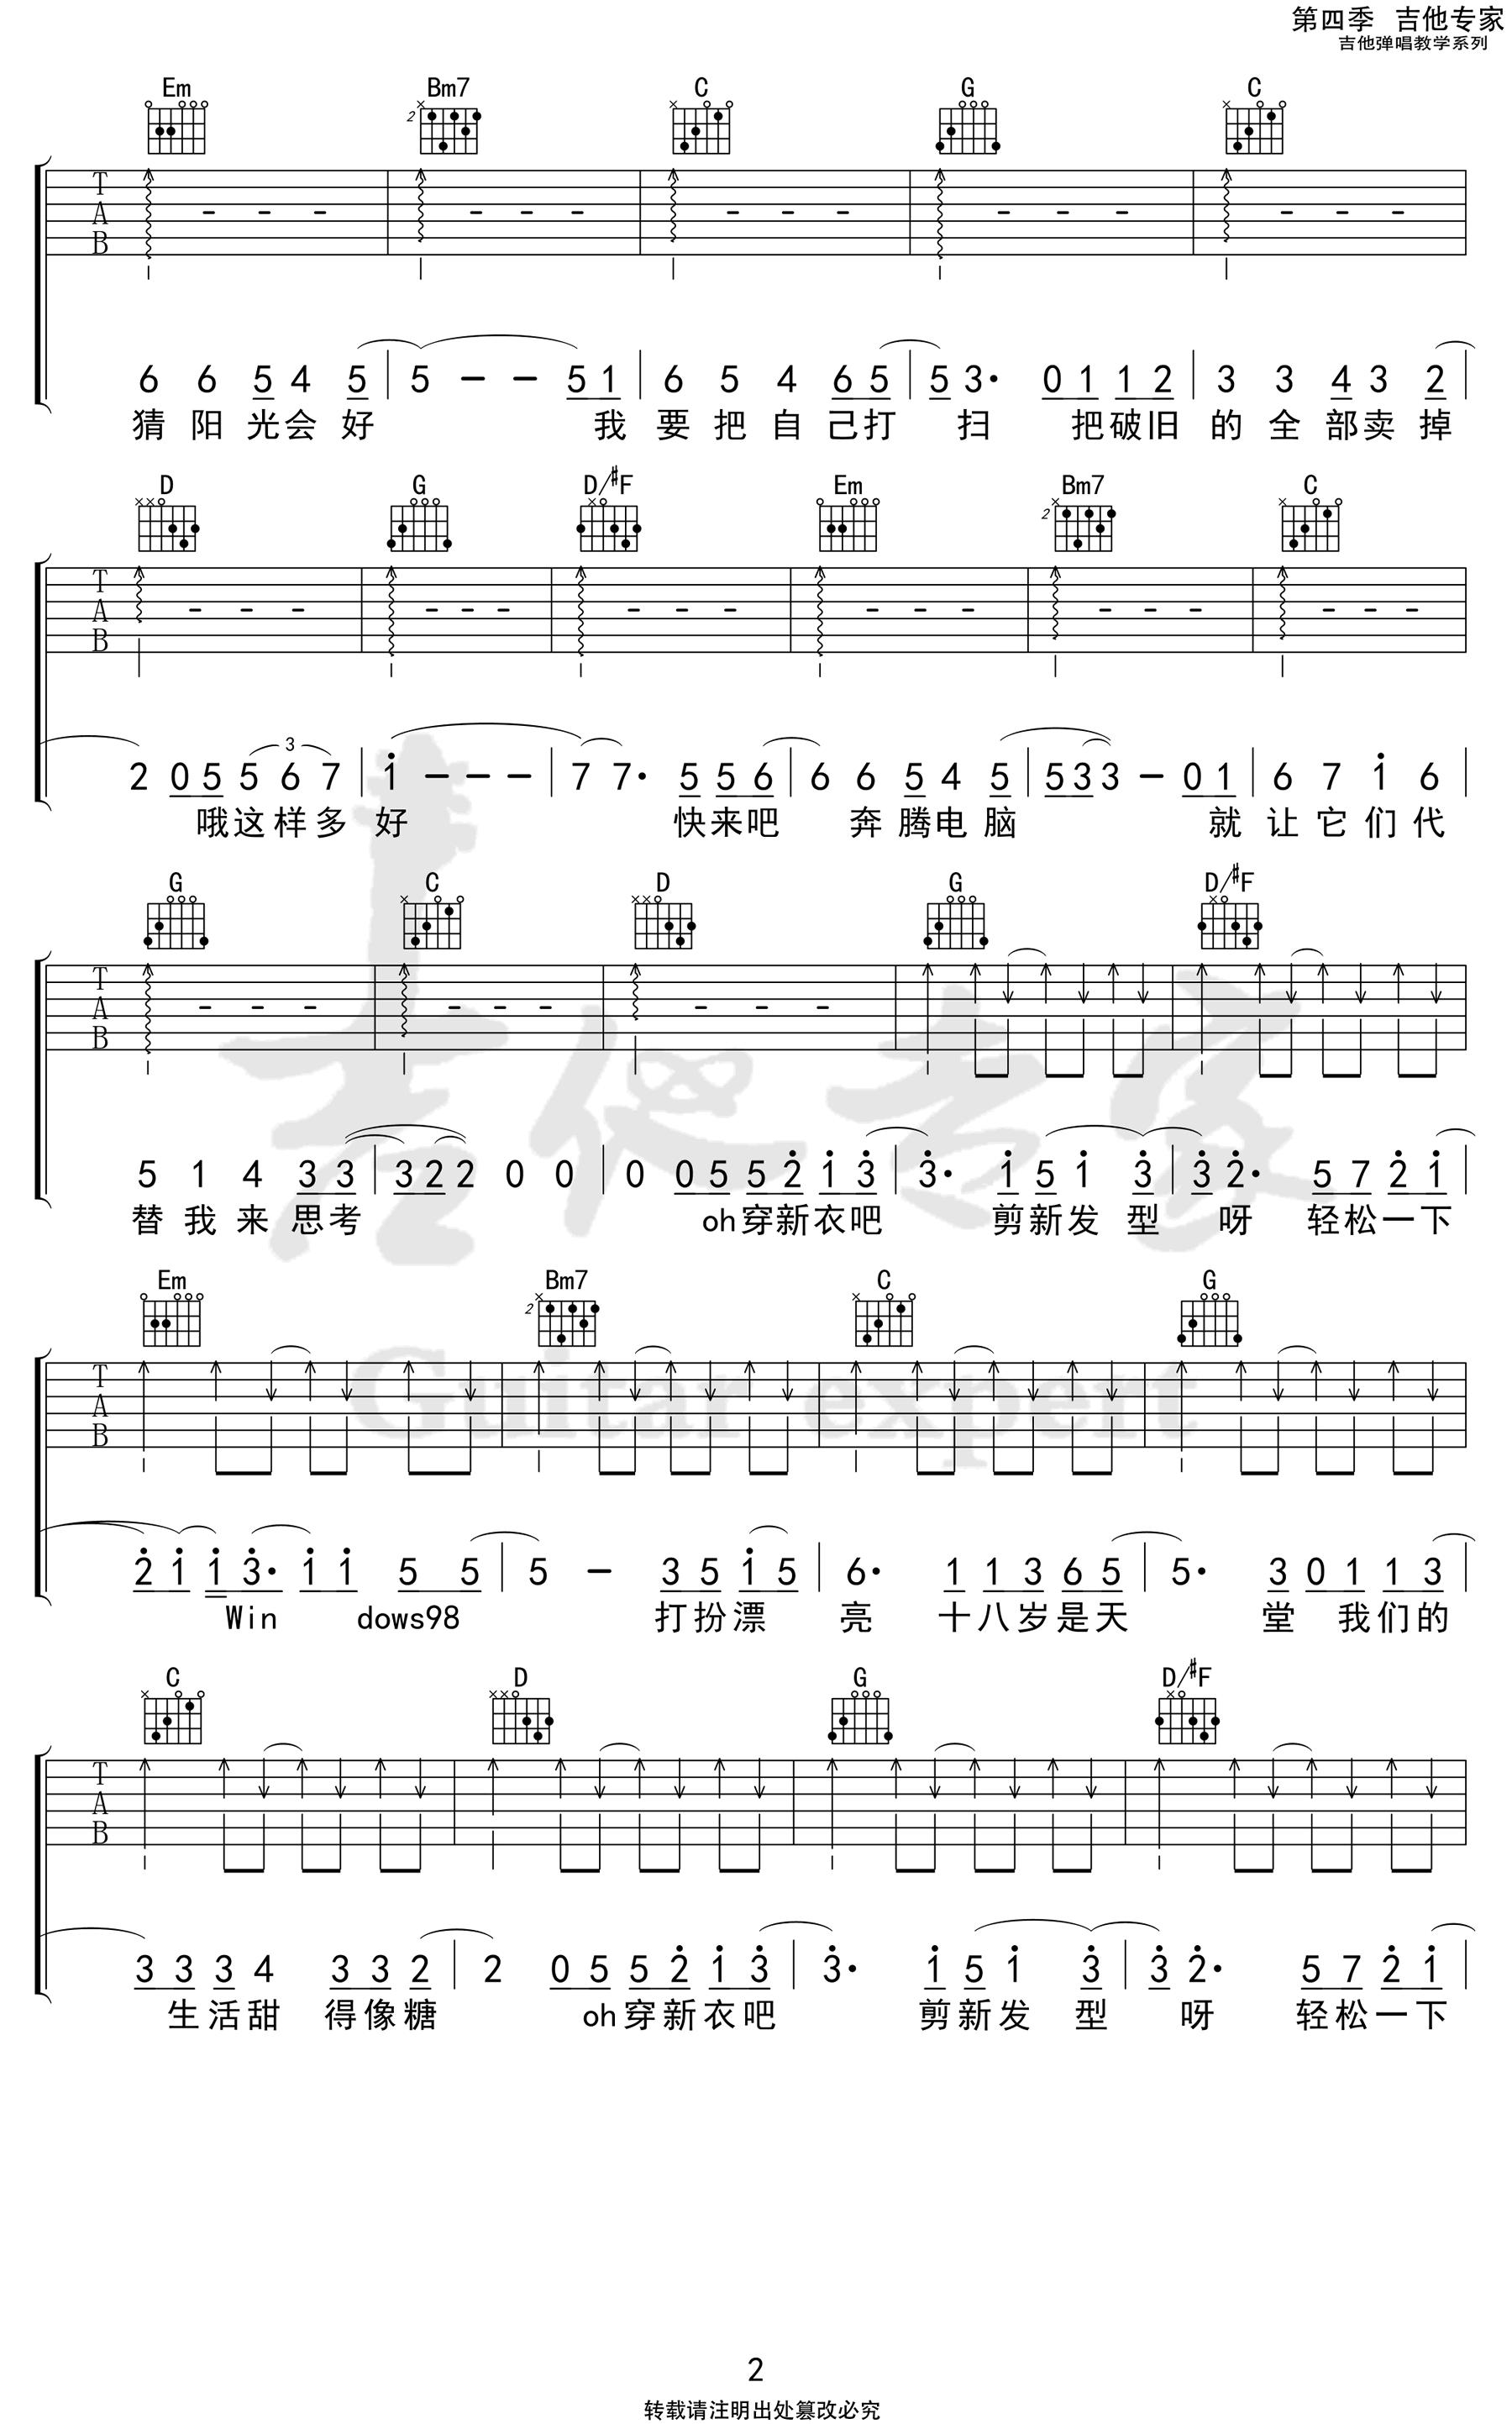 New Boy吉他谱_房东的猫/陈婧霏-2